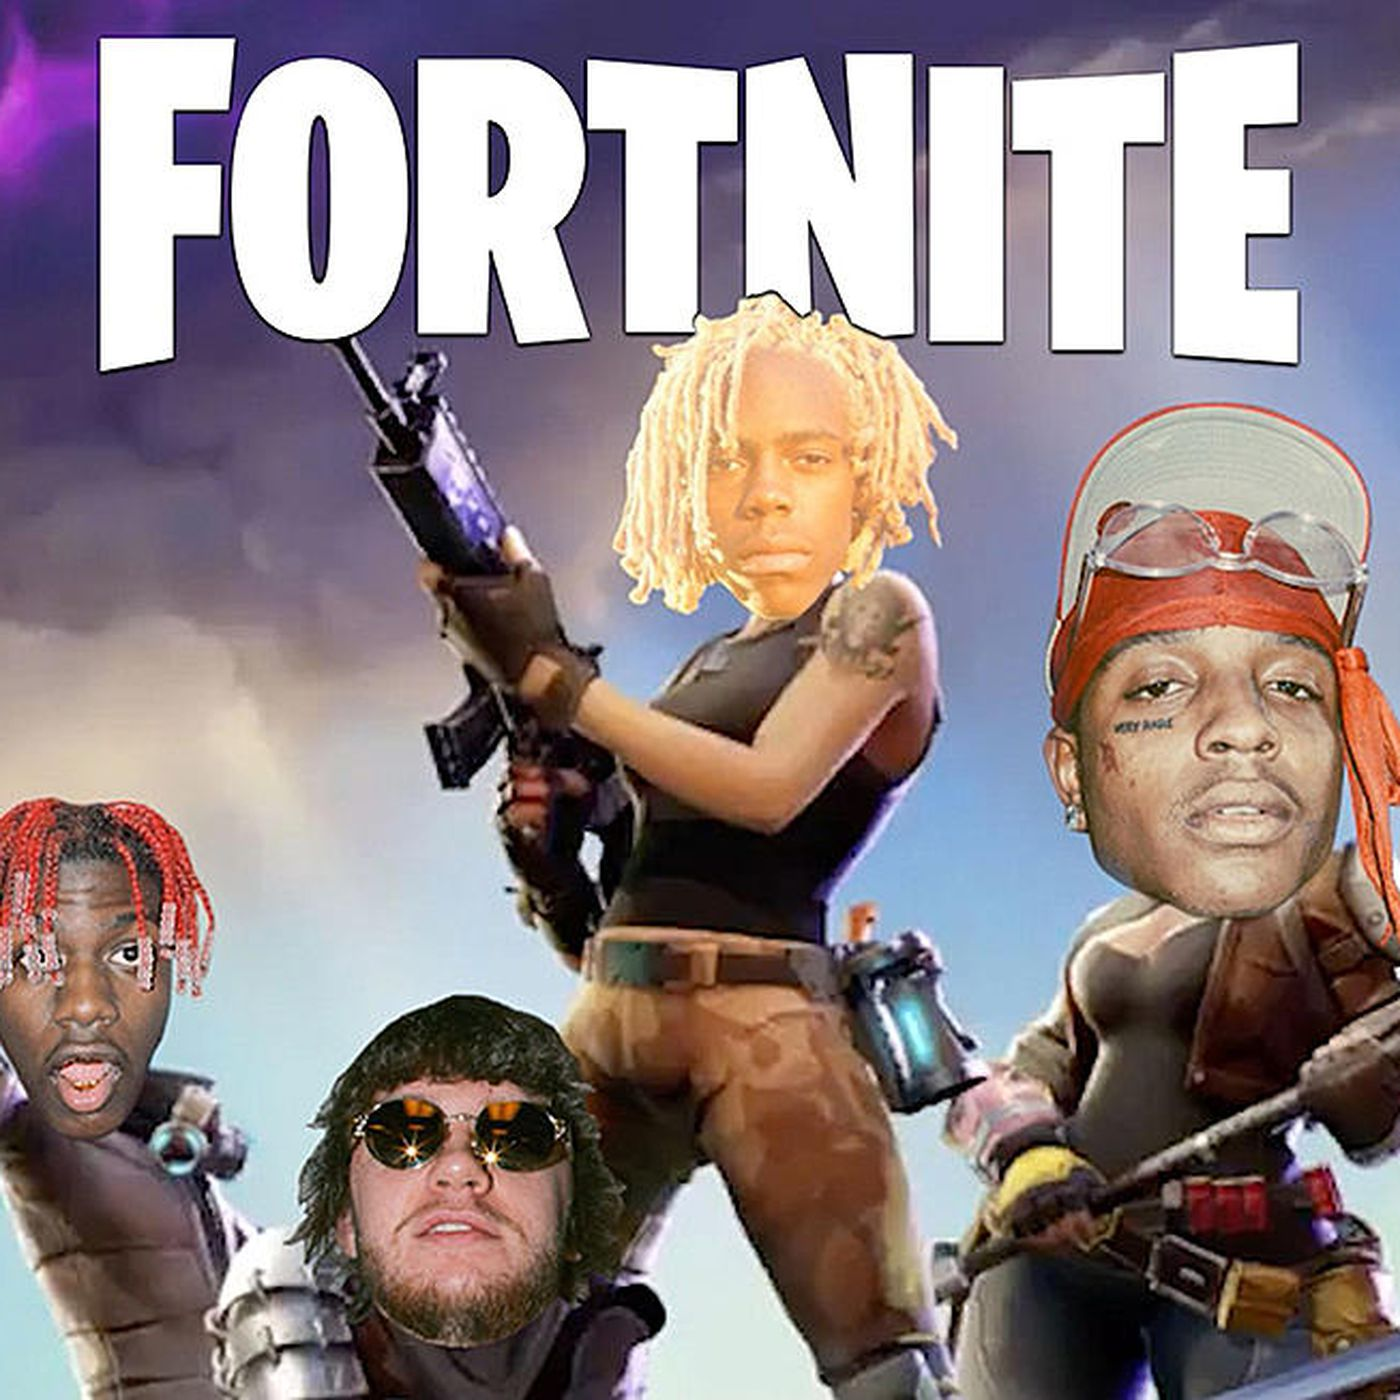 Murda Beatz's song Fortnite with Lil Yachty and Ski Mask The Slump